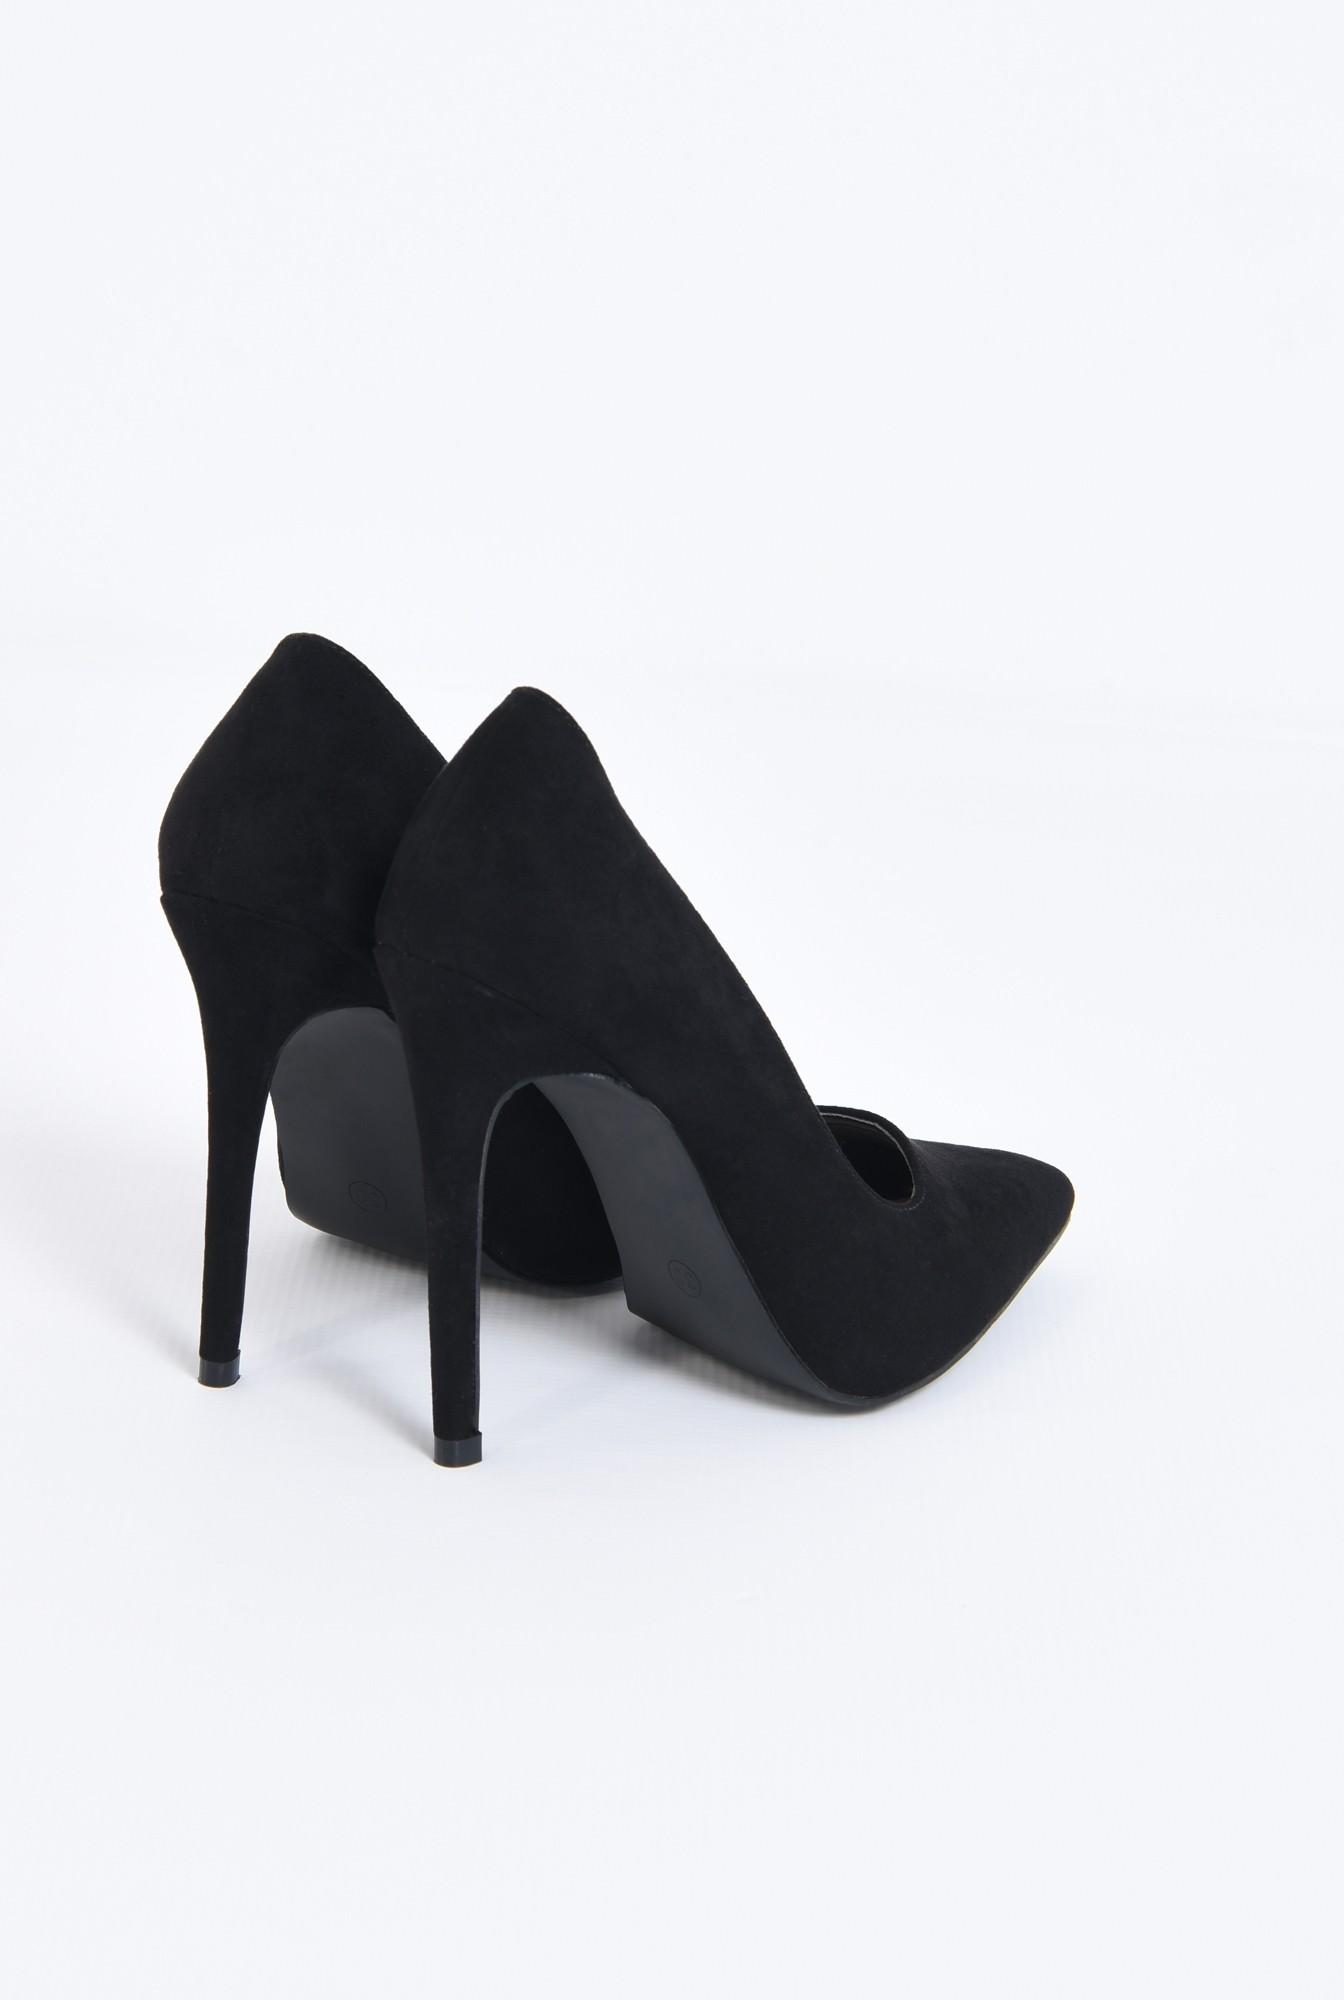 2 - pantofi de ocazie, varf ascutit, toc inalt